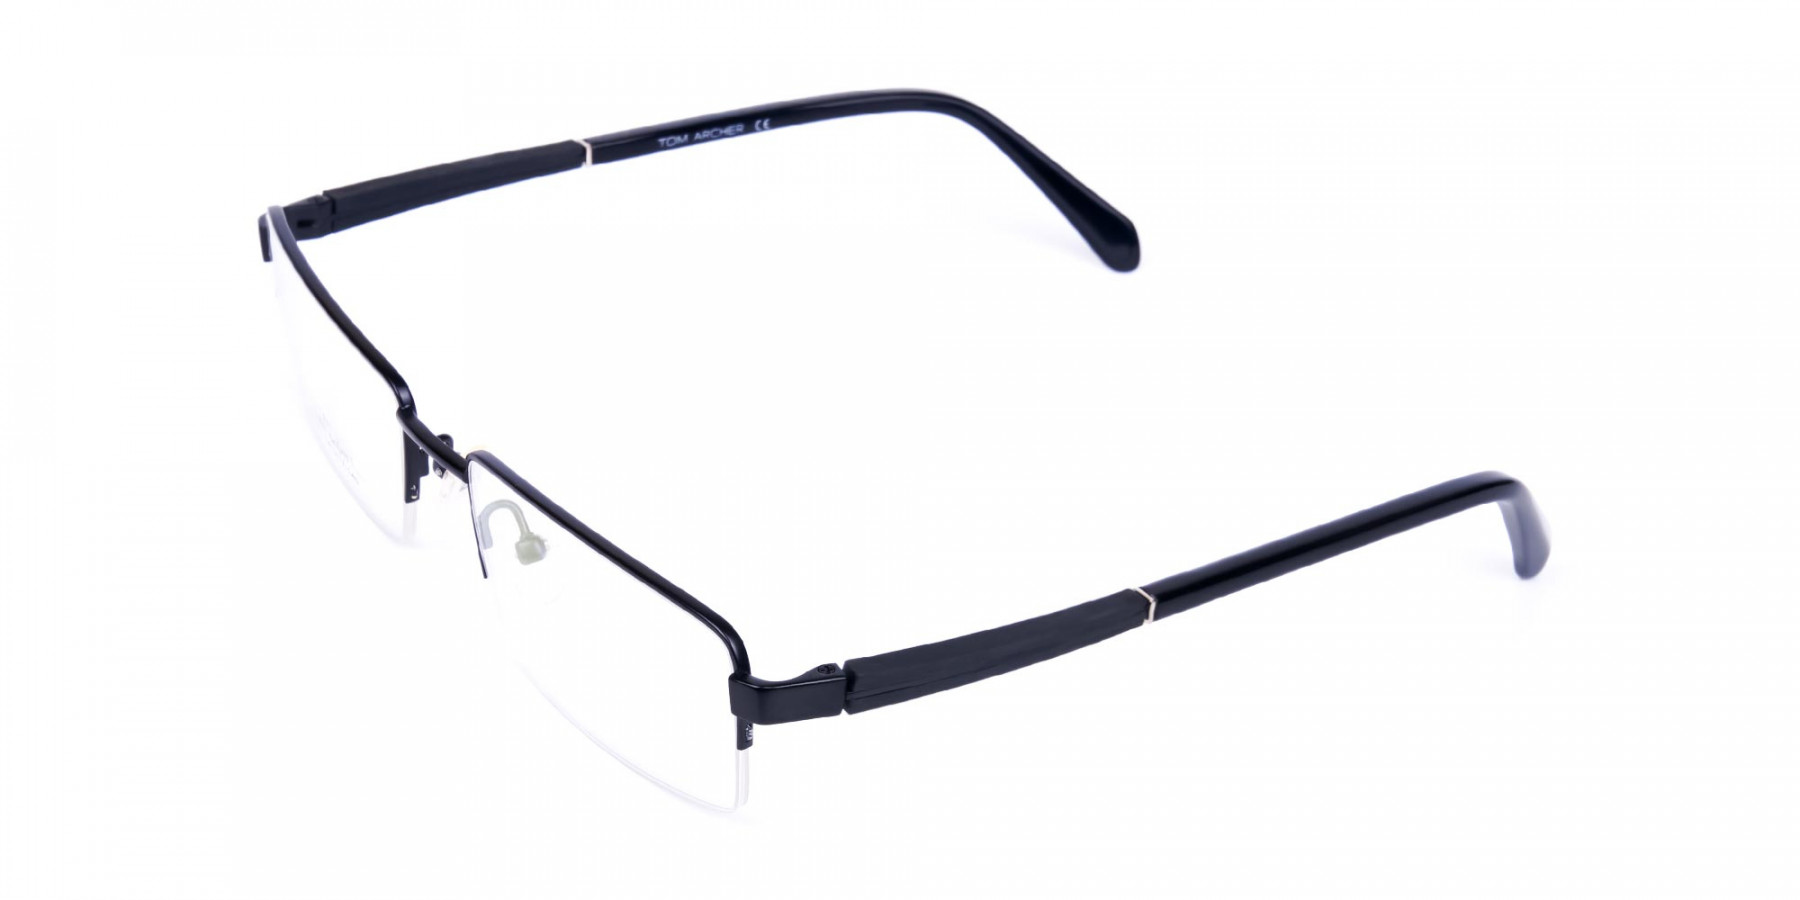 Black-Thick-Rectangle-Glasses-Frames-1